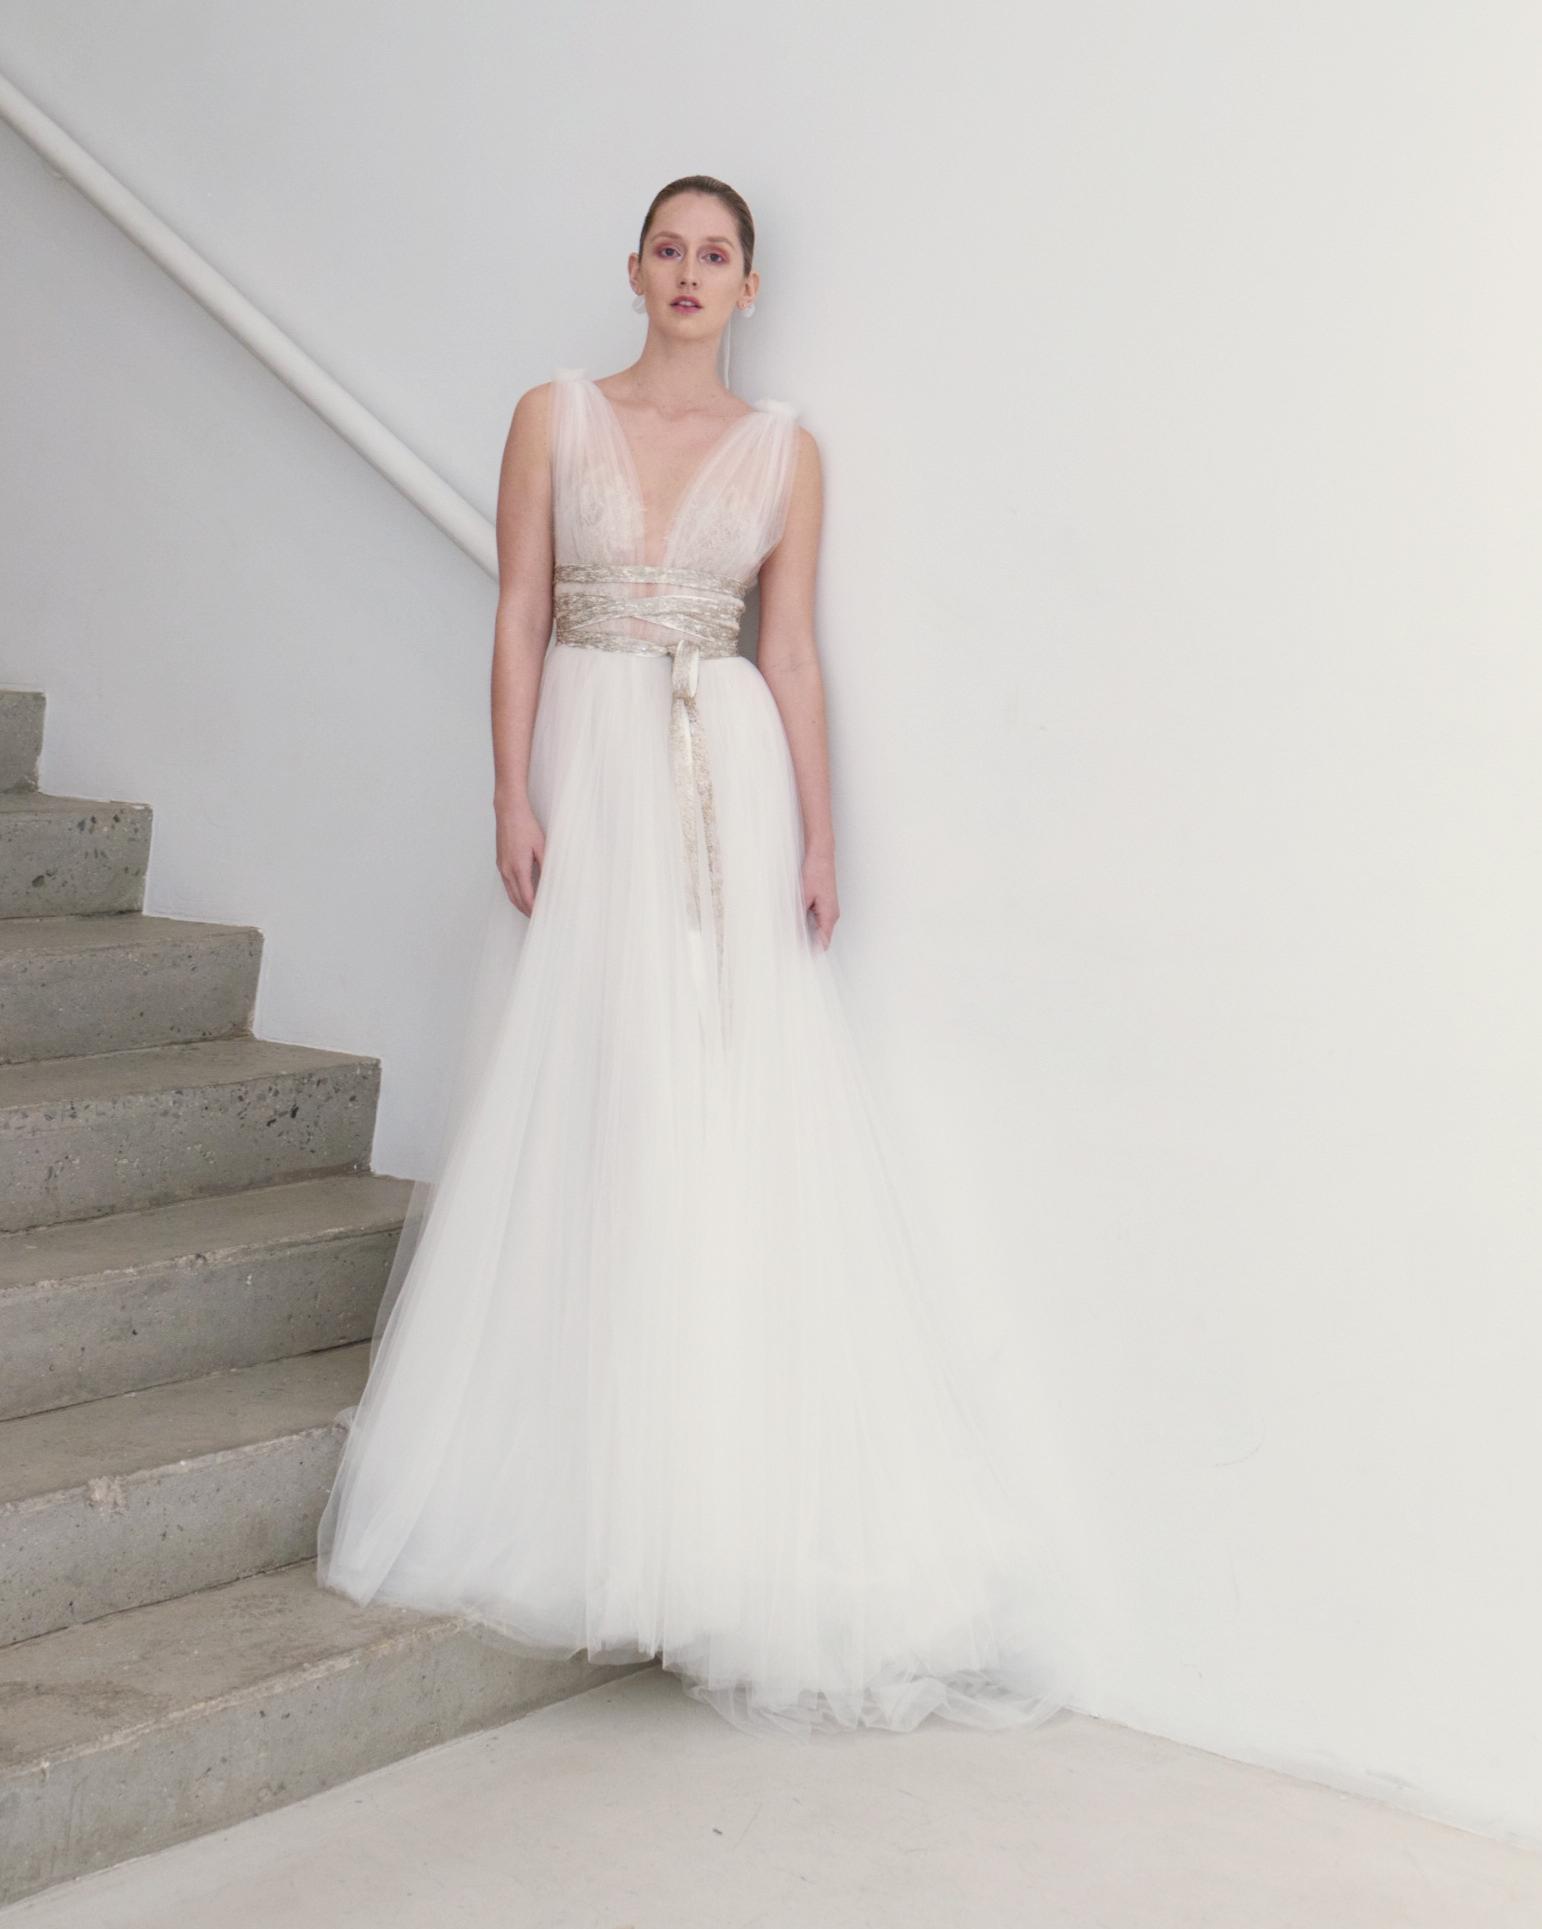 francesca miranda wedding dress spring 2019 tulle a-line